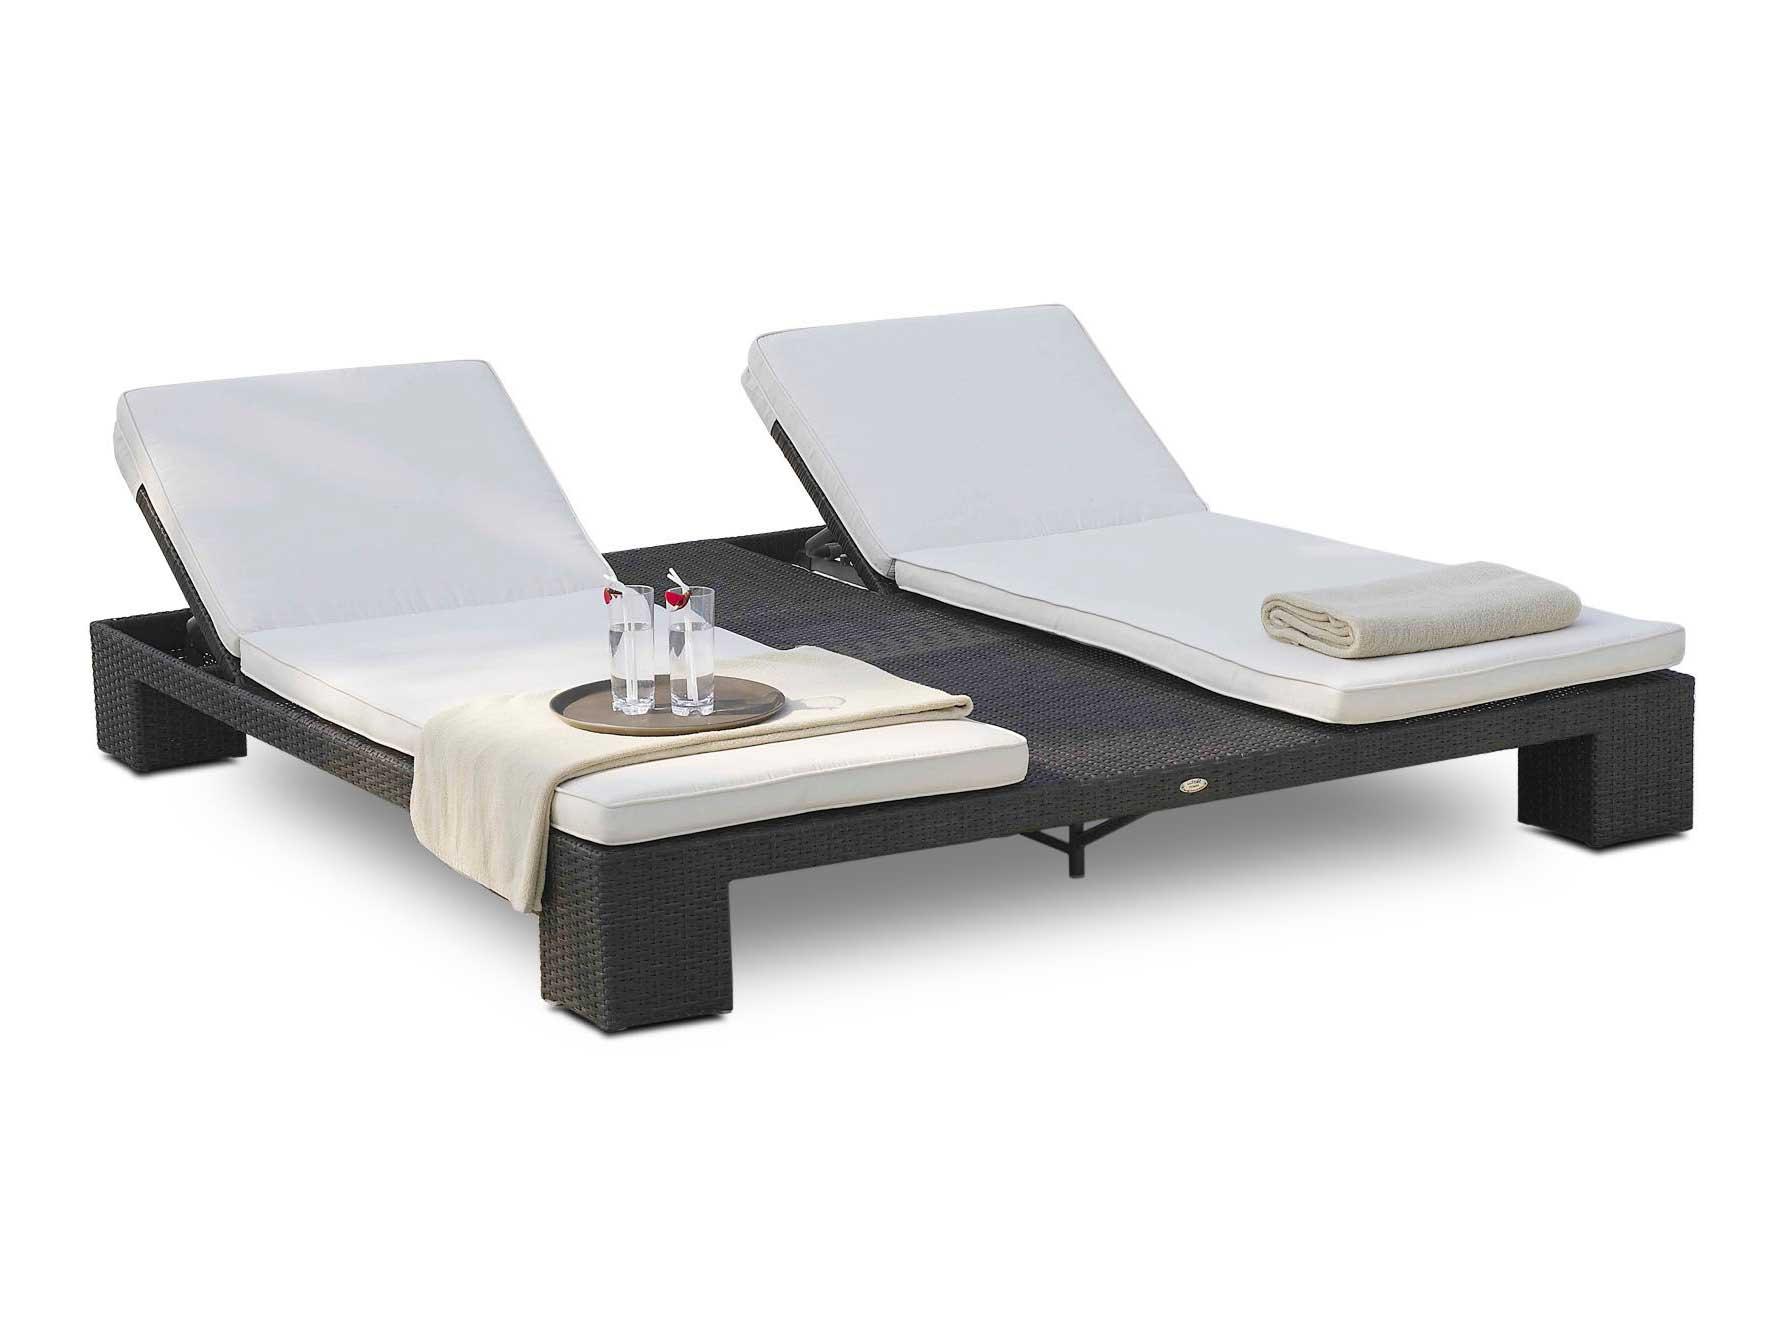 double bain de soleil de jardin relaxation sunny de lusso 6043. Black Bedroom Furniture Sets. Home Design Ideas